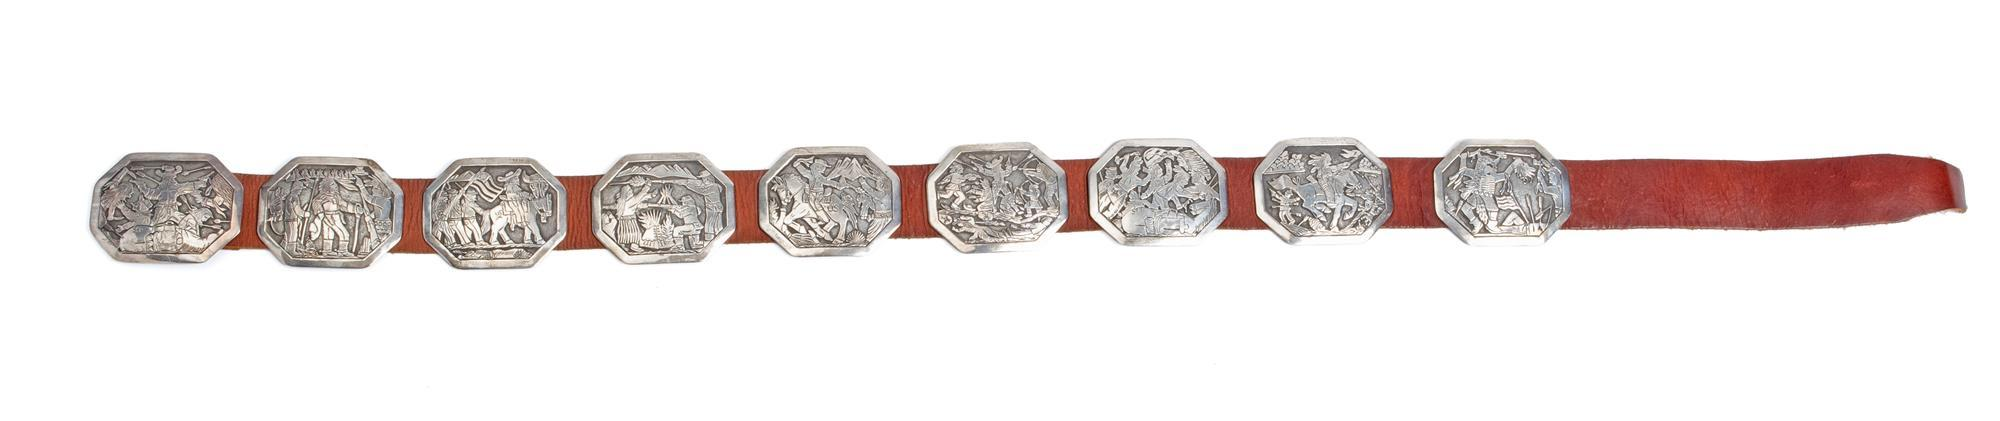 "A Navajo Floyd Becenti Jr. ""Custer's Last Stand"" silver concho belt"